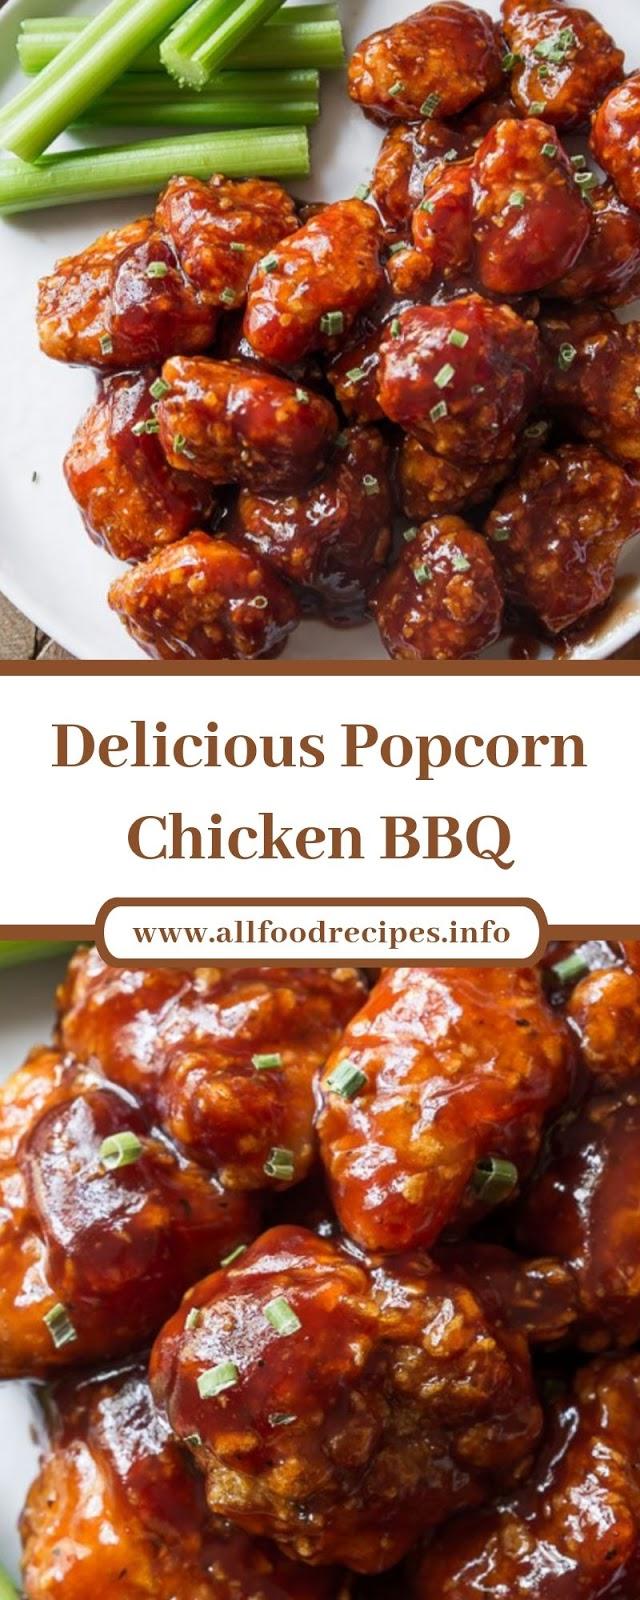 Delicious Popcorn Chicken BBQ